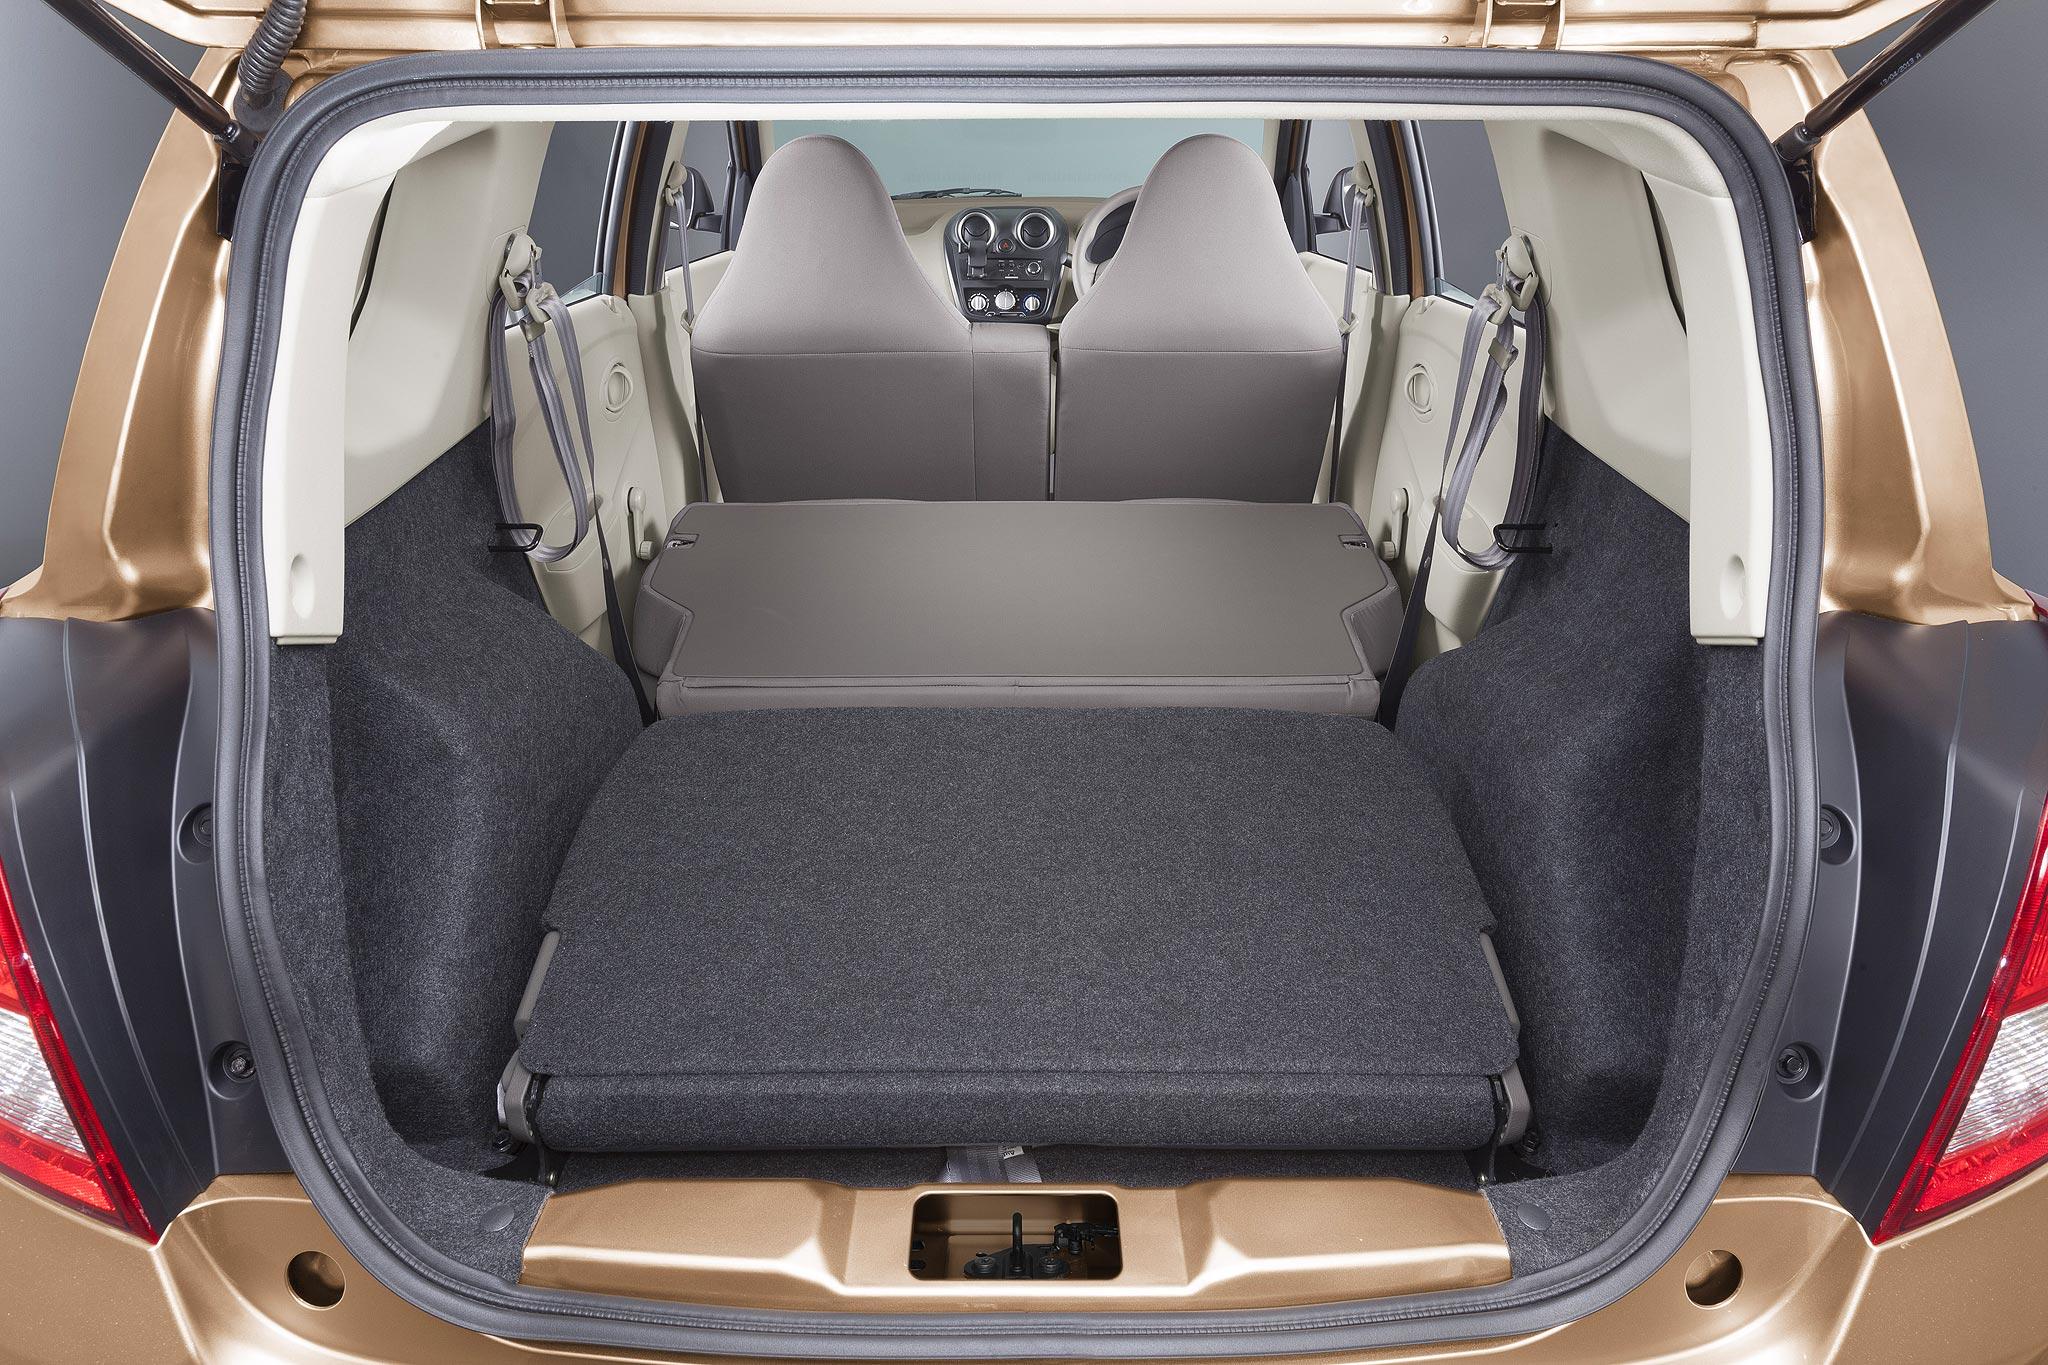 Datsun, Datsun GO Plus folding seat: Nih Gambar Datsun GO Plus High-Resolution